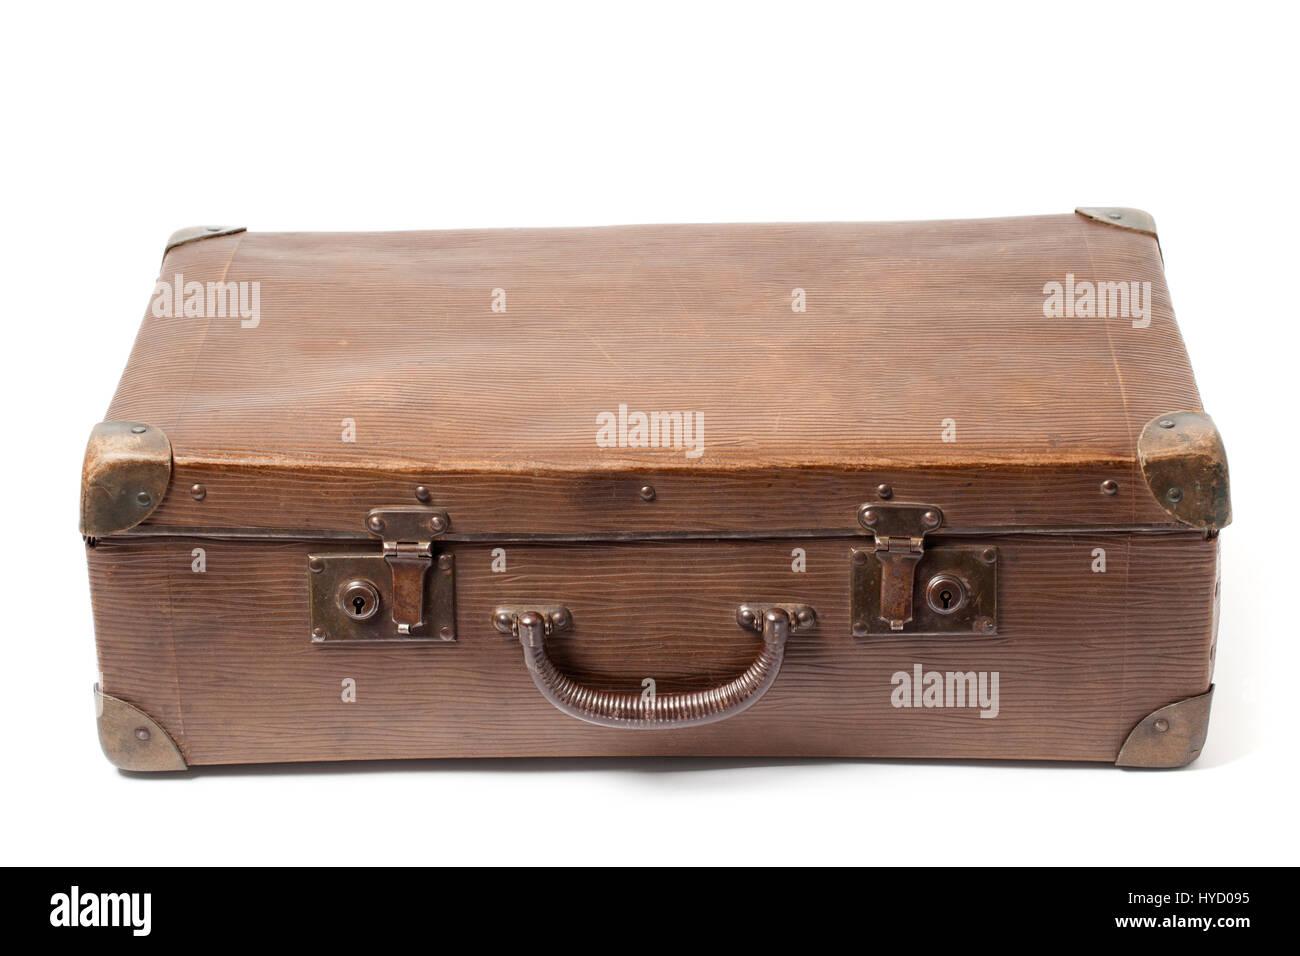 Closed obsolete suitcase isolated on white background. - Stock Image